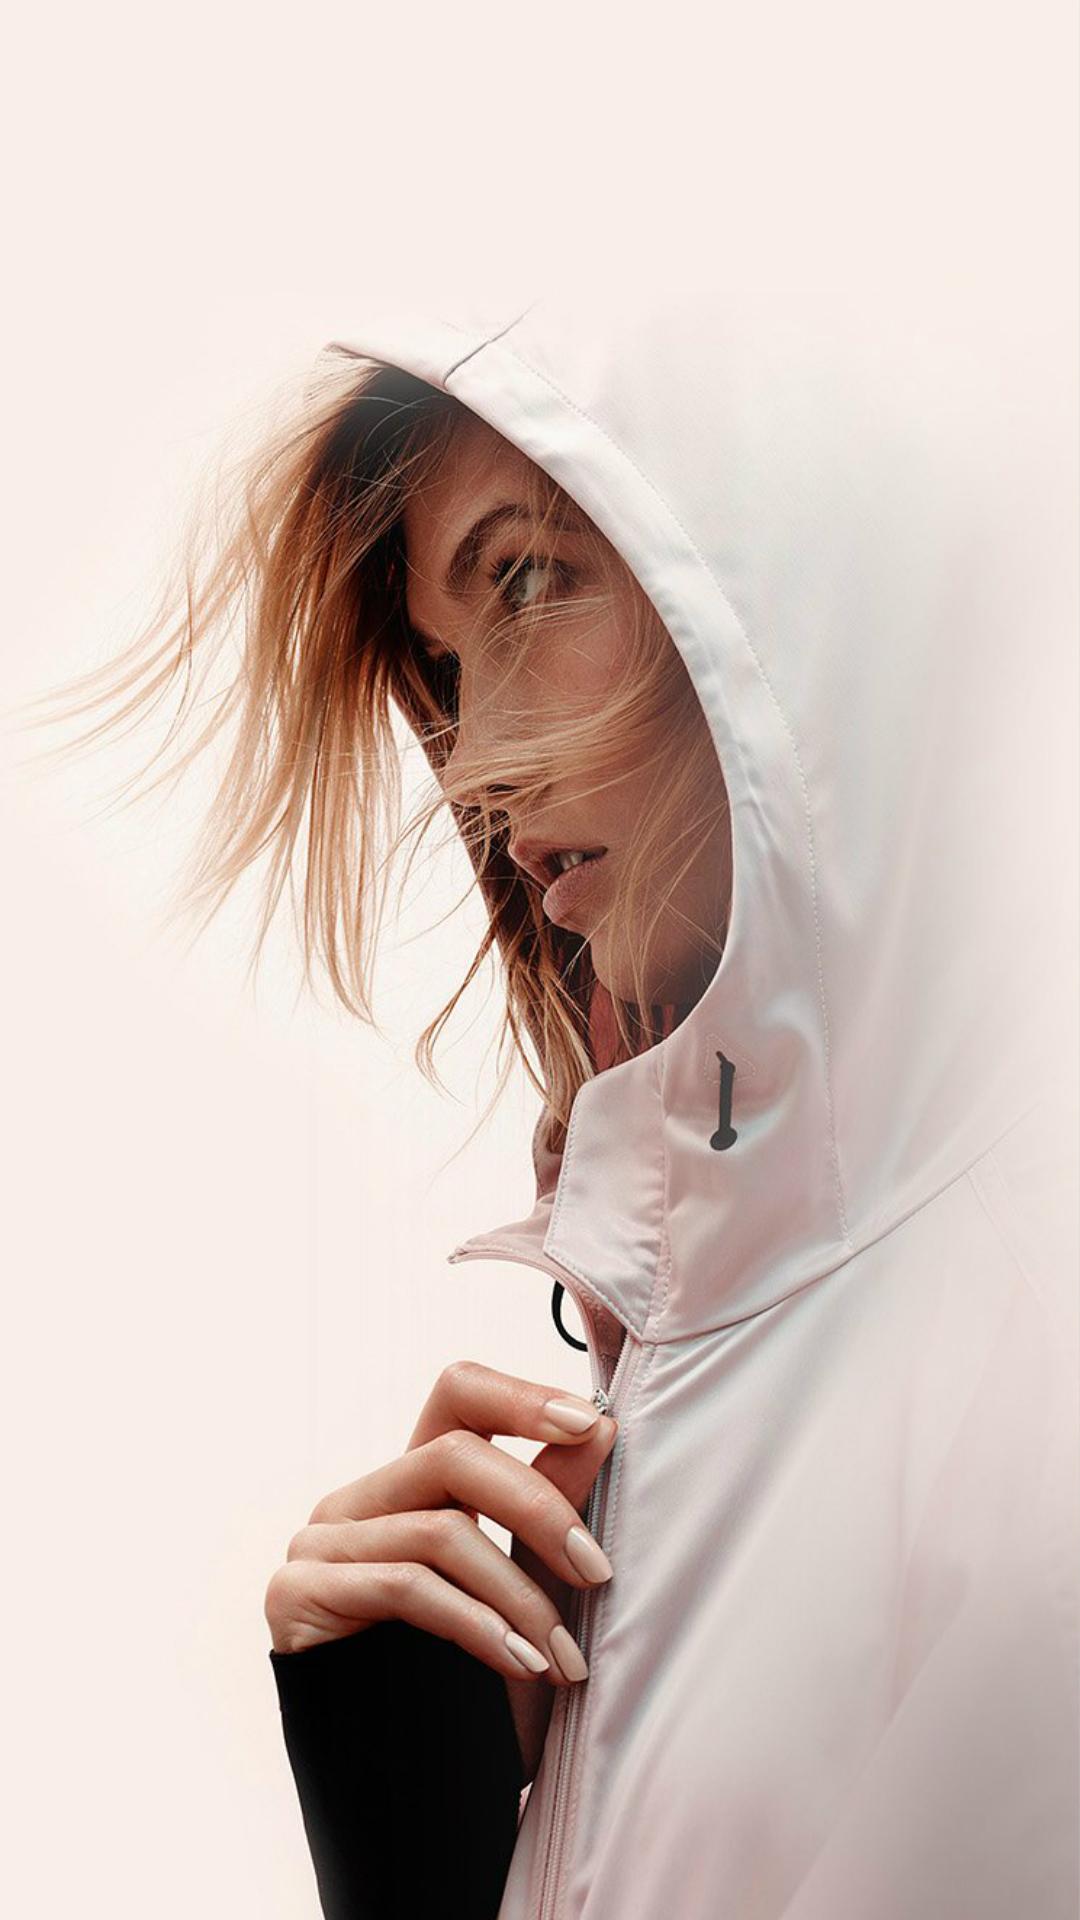 Model Karlie Kloss Natural Girl Sports iPhone 8 Wallpapers 1080x1920